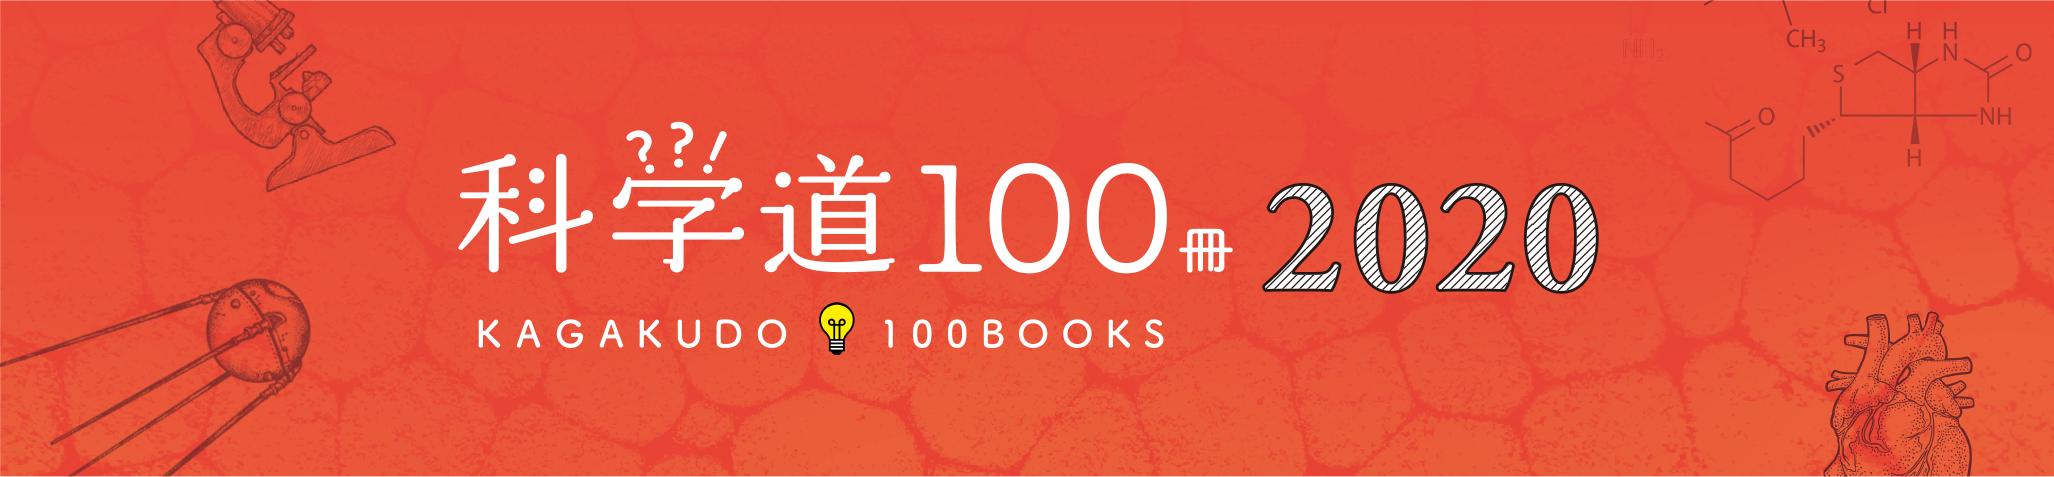 KAGAKUDO 100BOOKS 科学道100冊(2020)「知りたい!」が未来をつくる